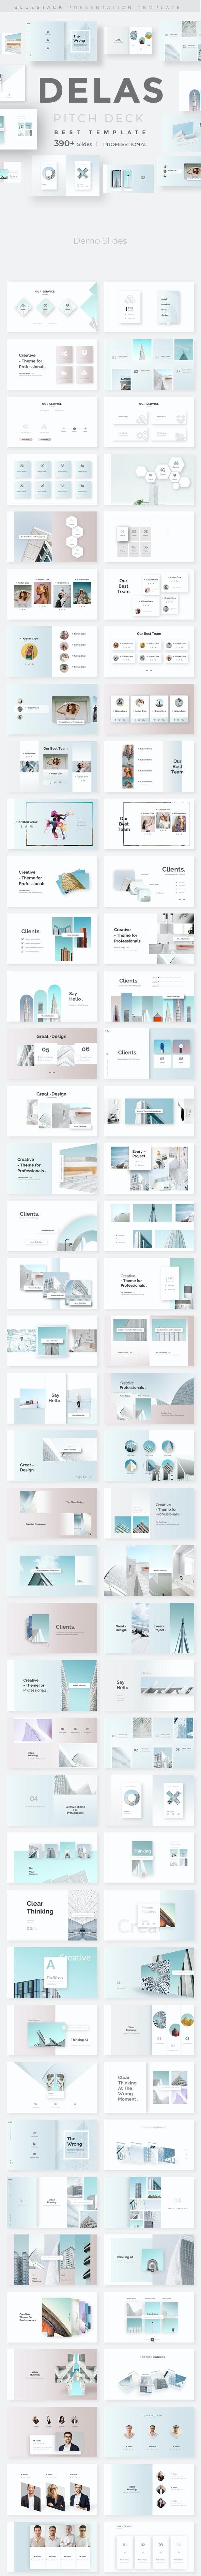 Delas Minimal Design Powerpoint Template - Creative PowerPoint Templates